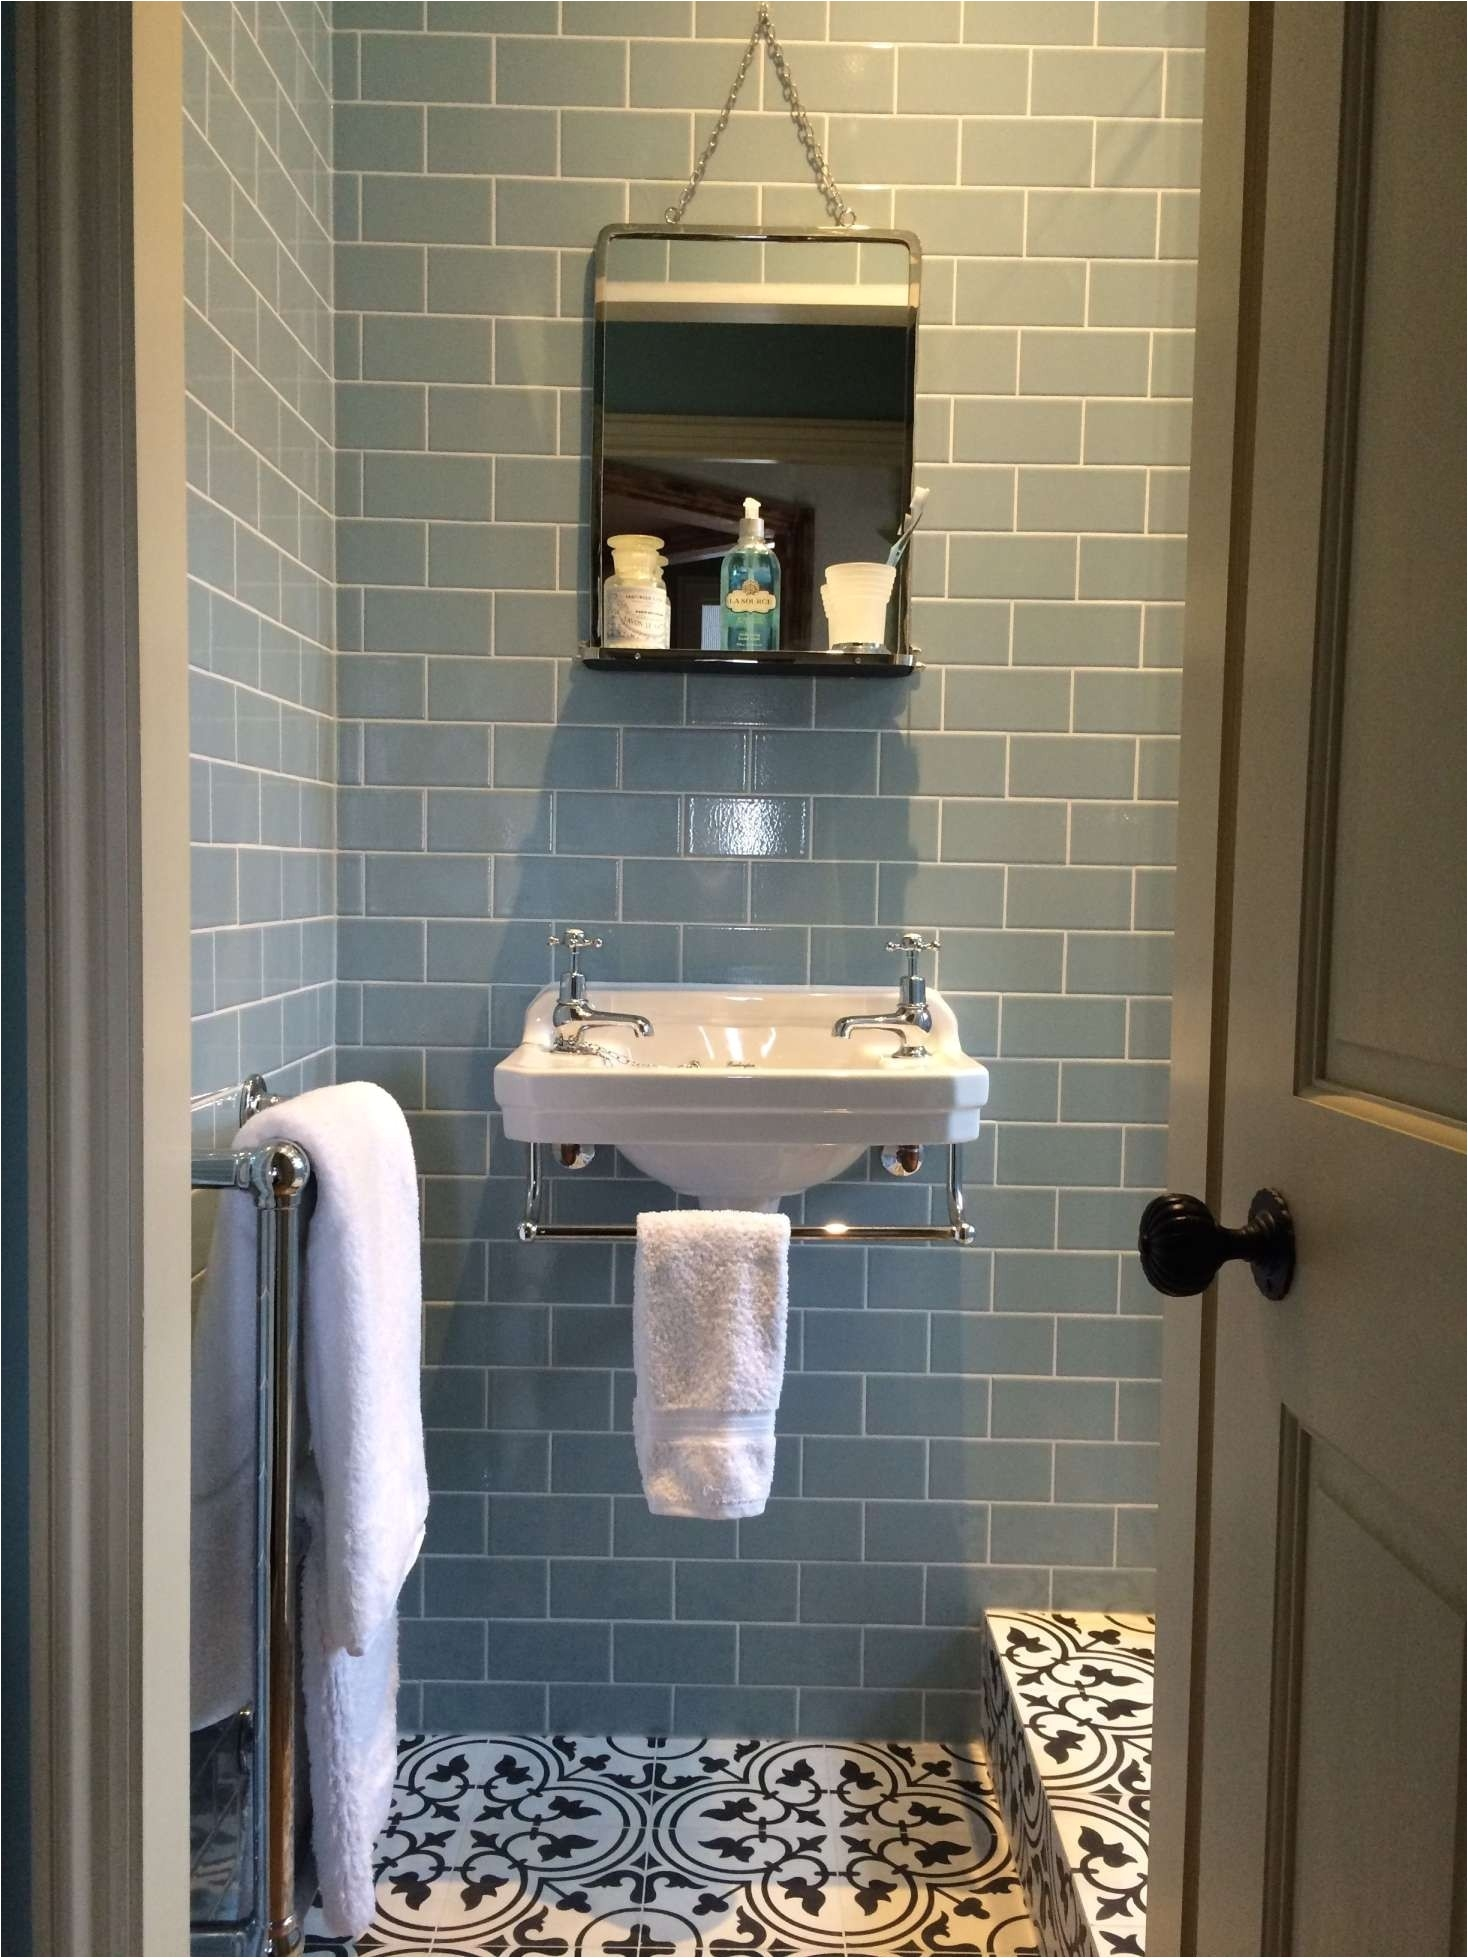 Retro Bathroom Tile Design Ideas New Bathroom Tile Inspirationa Bathroom Floor Tile Design Ideas New